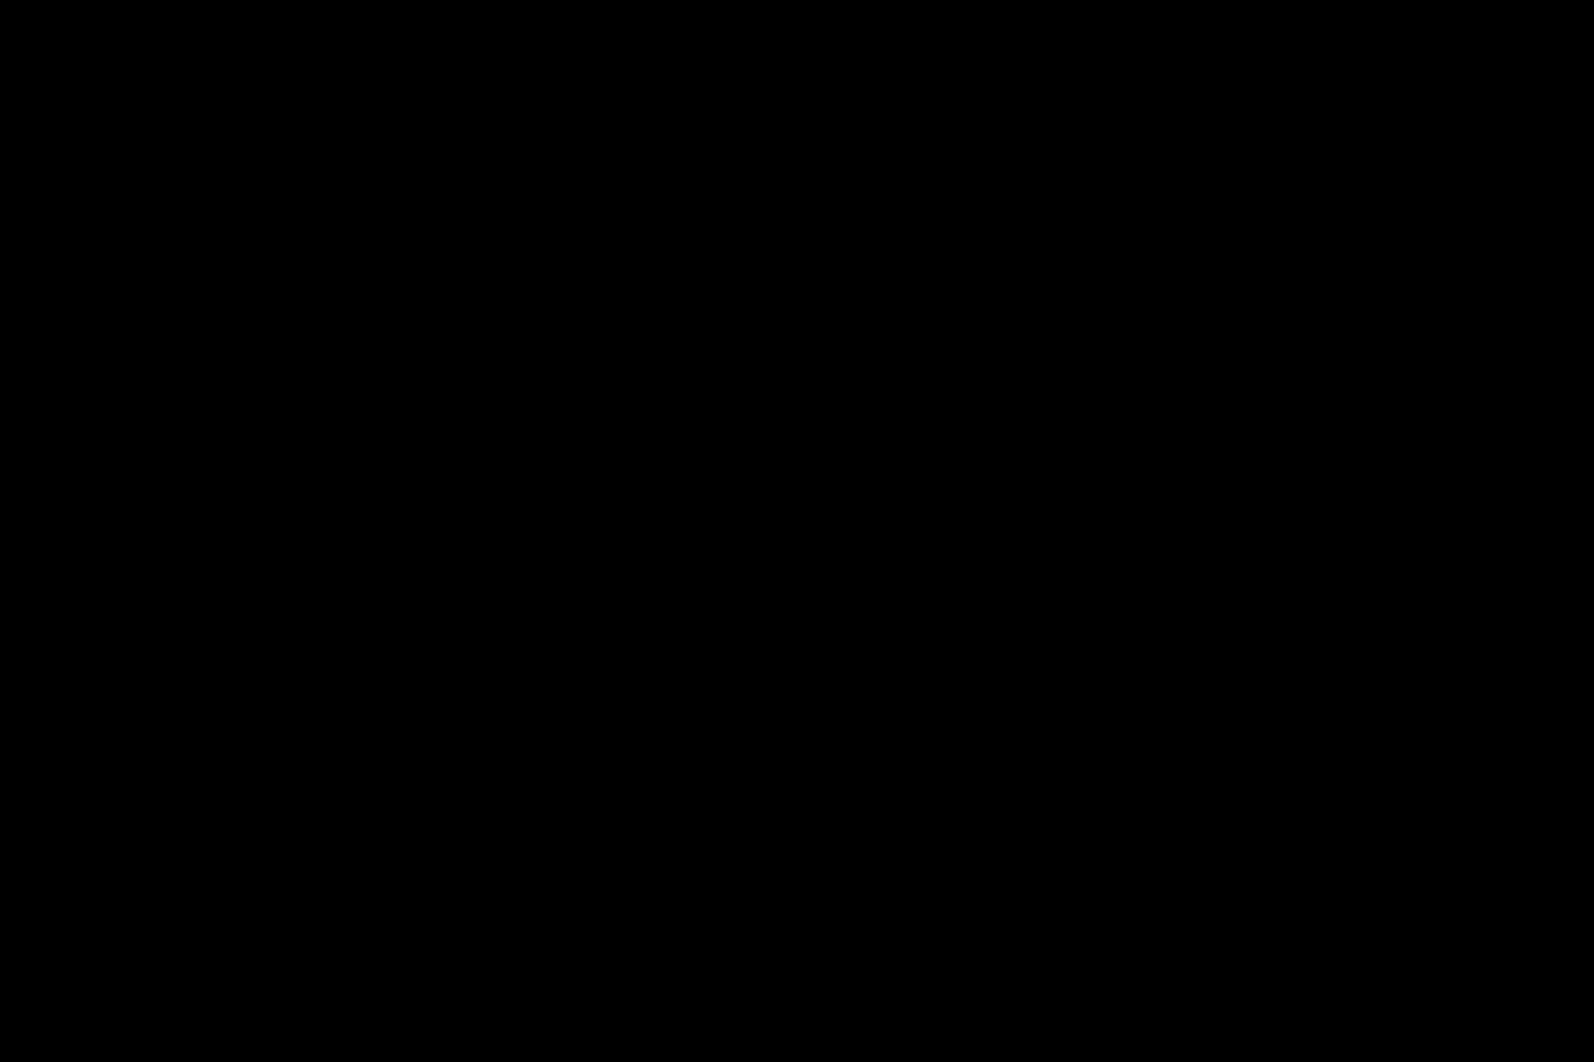 Outline : Scrolls Icon set - DEPLOMA 01 -